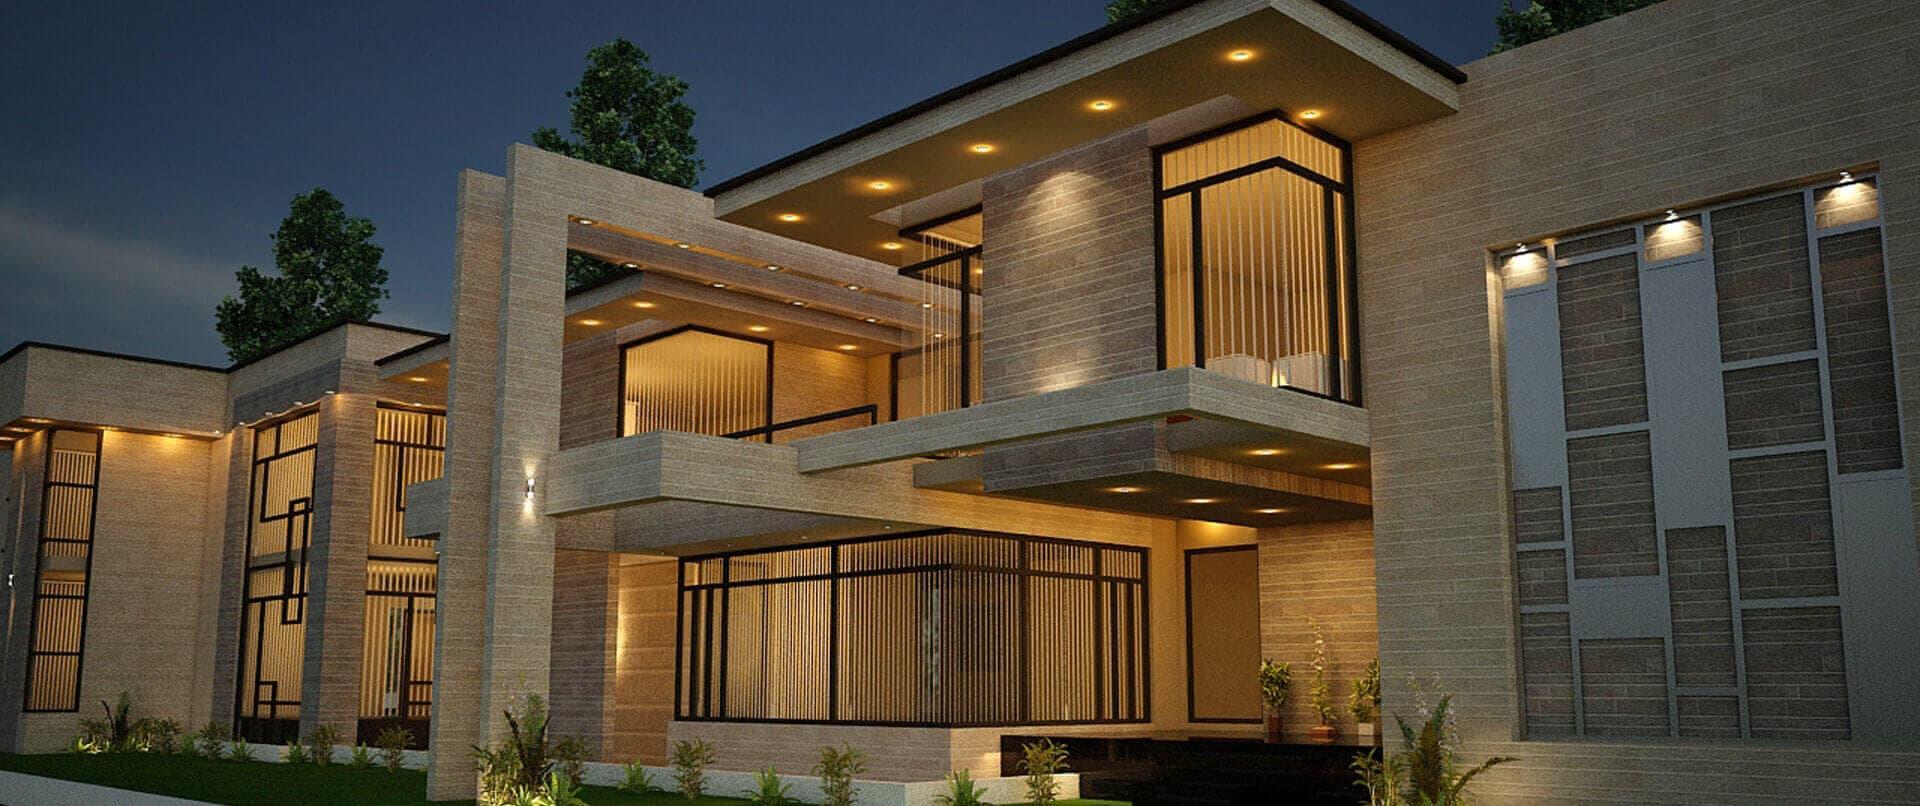 Home Best Interior Design